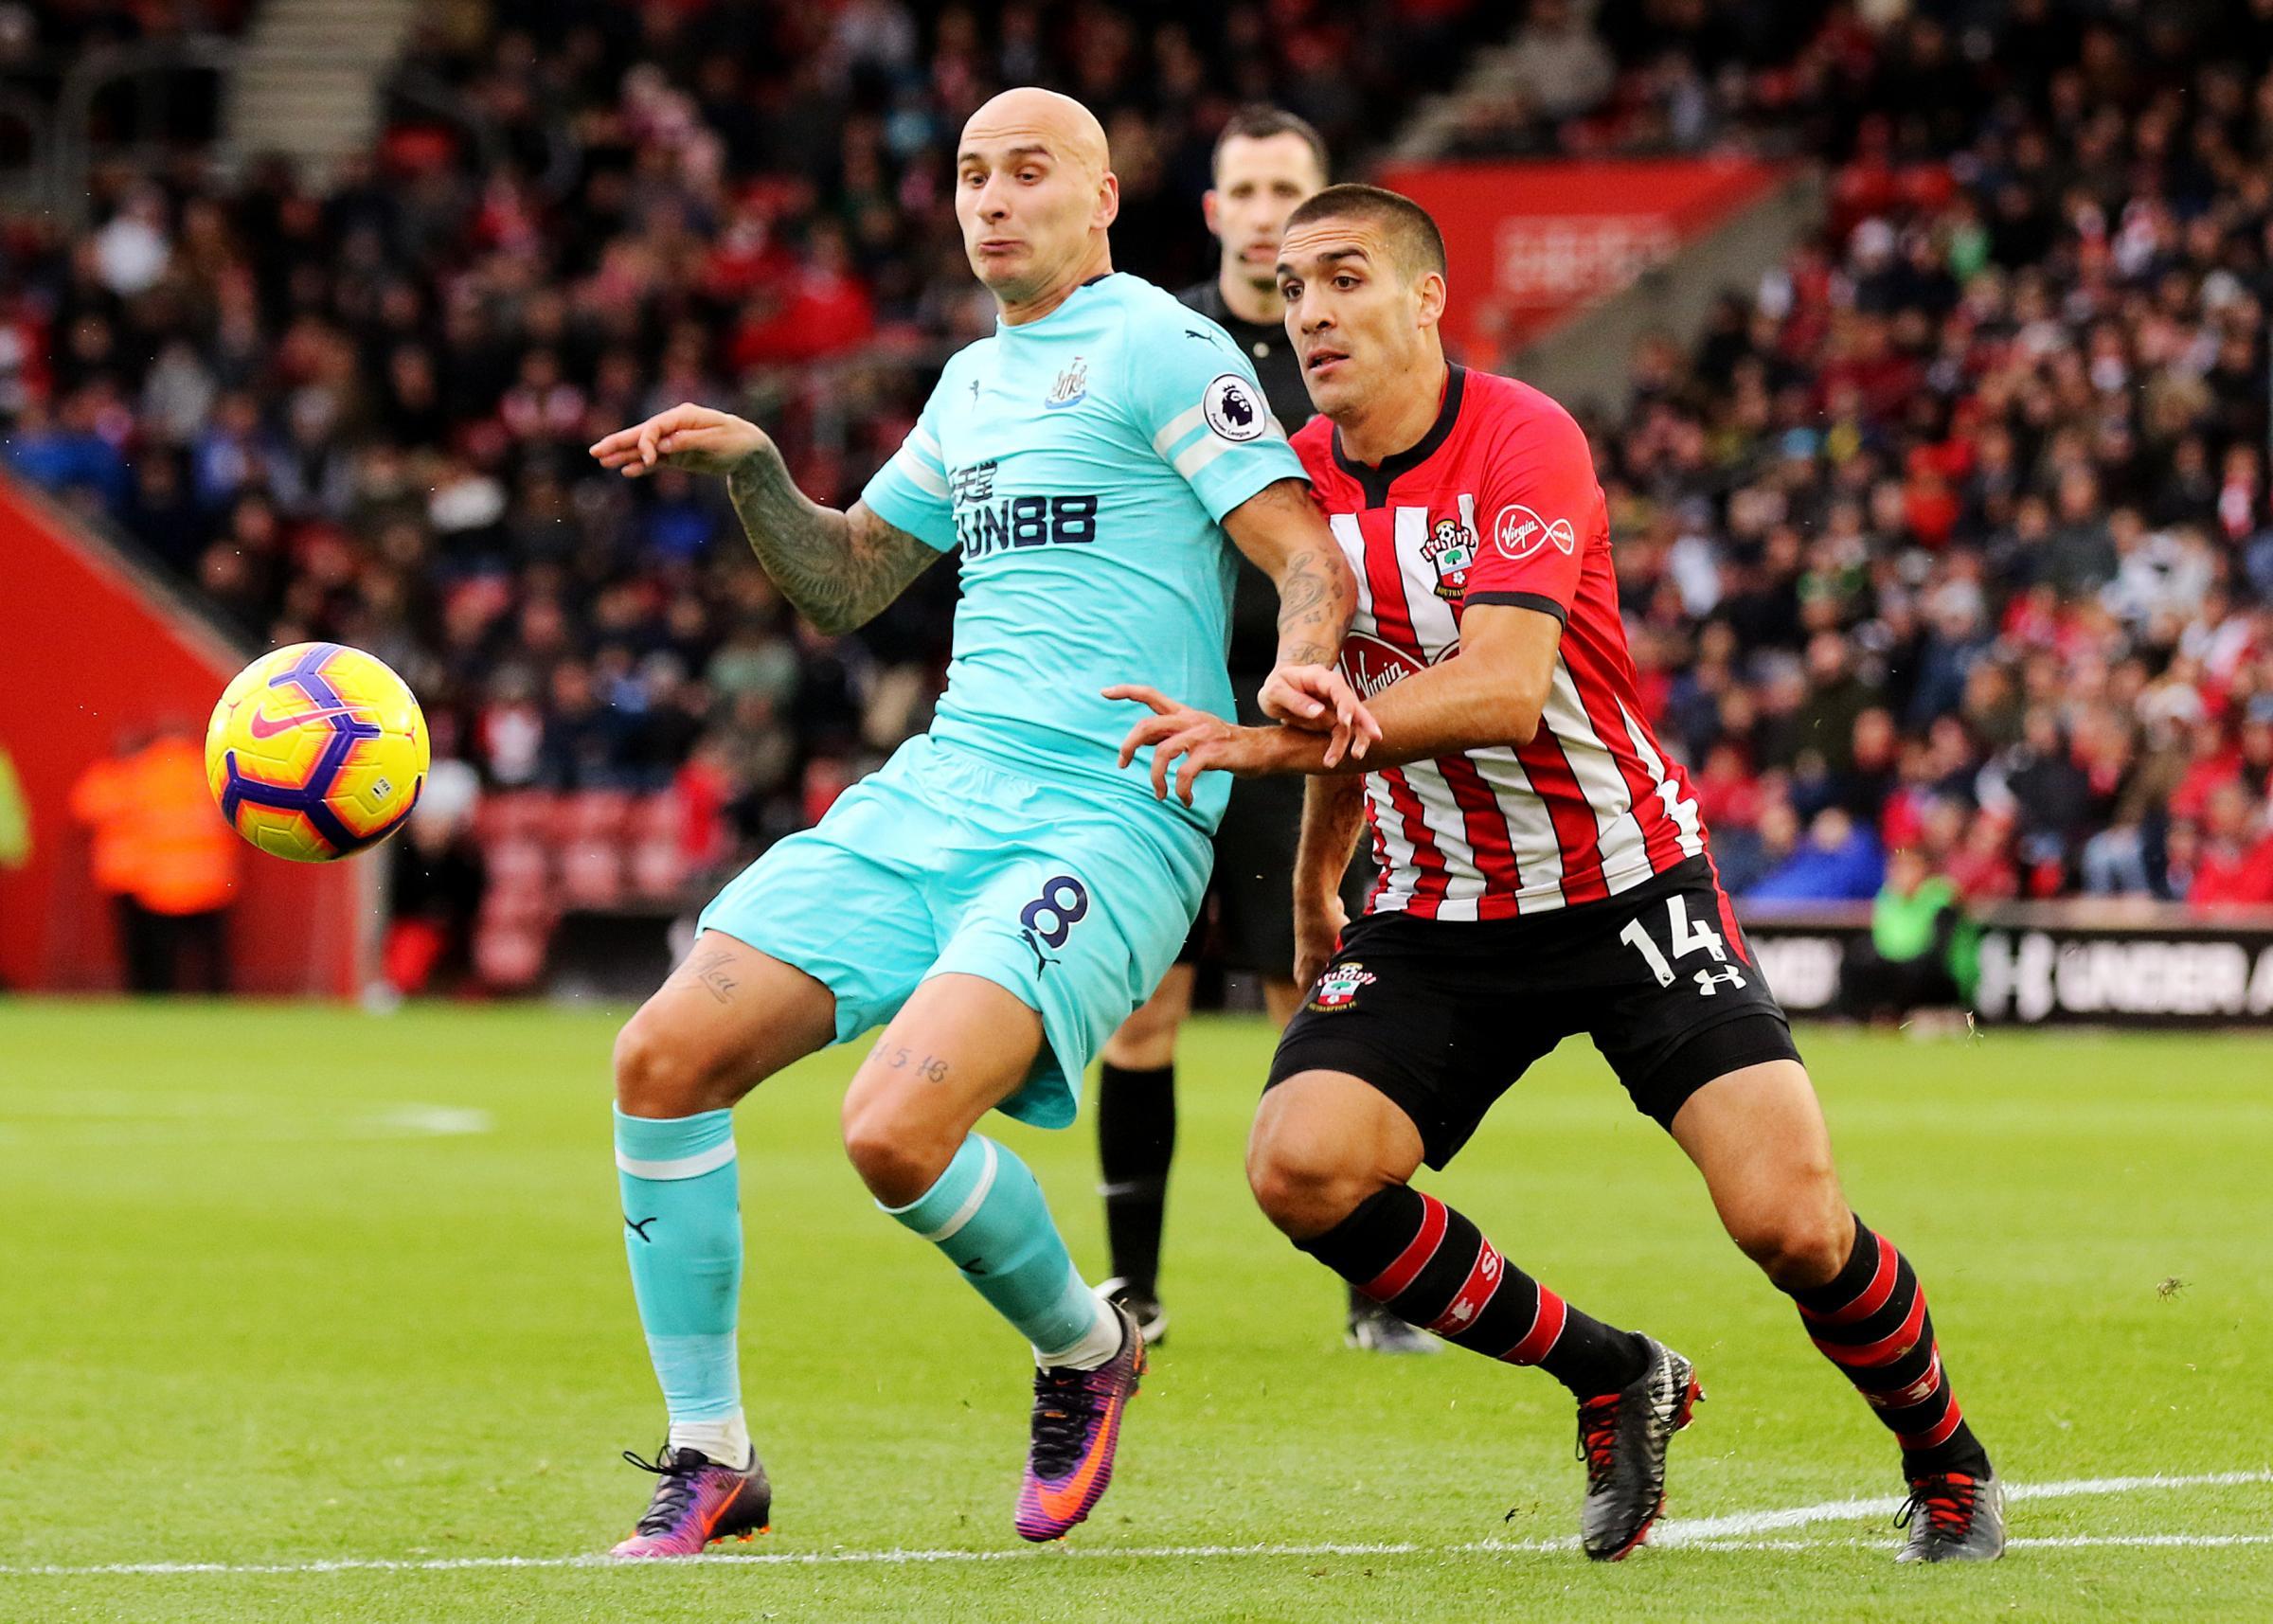 THE BIG PREVIEW: Newcastle v Saints